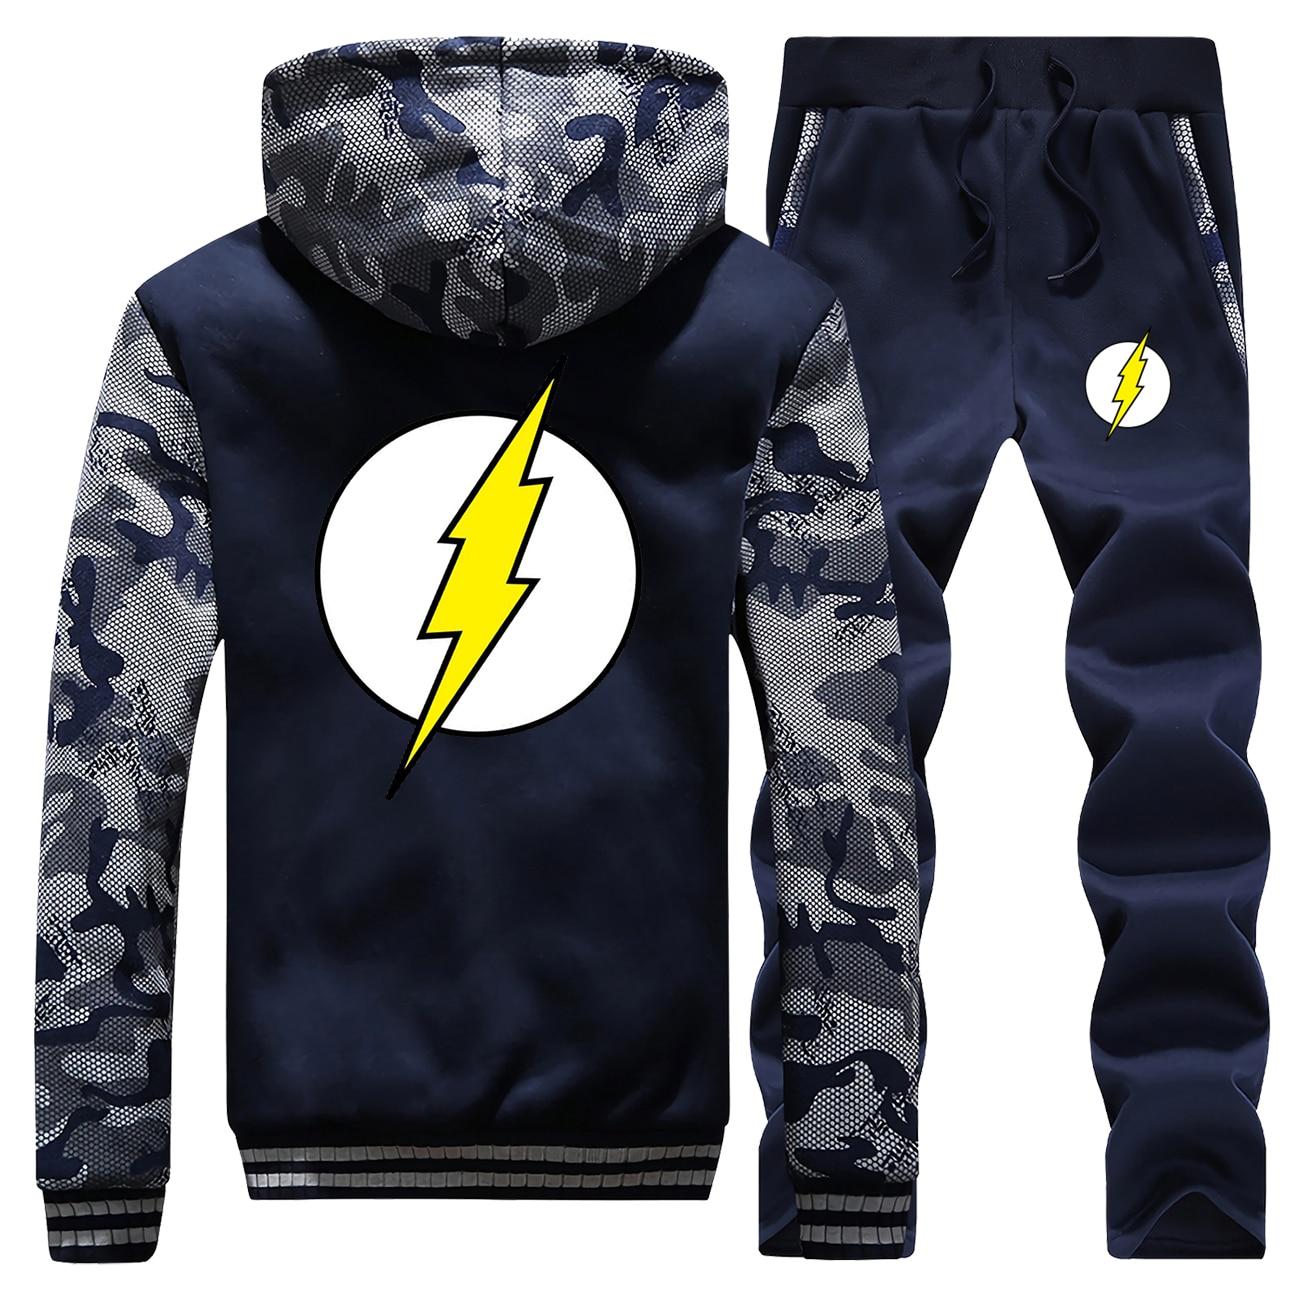 Männer Die Big Bang Sportswear Sheldon Lee Cooper Cosplay Camoflage Jacken Die Flash Super Hero Mode männer Sets jogginghose